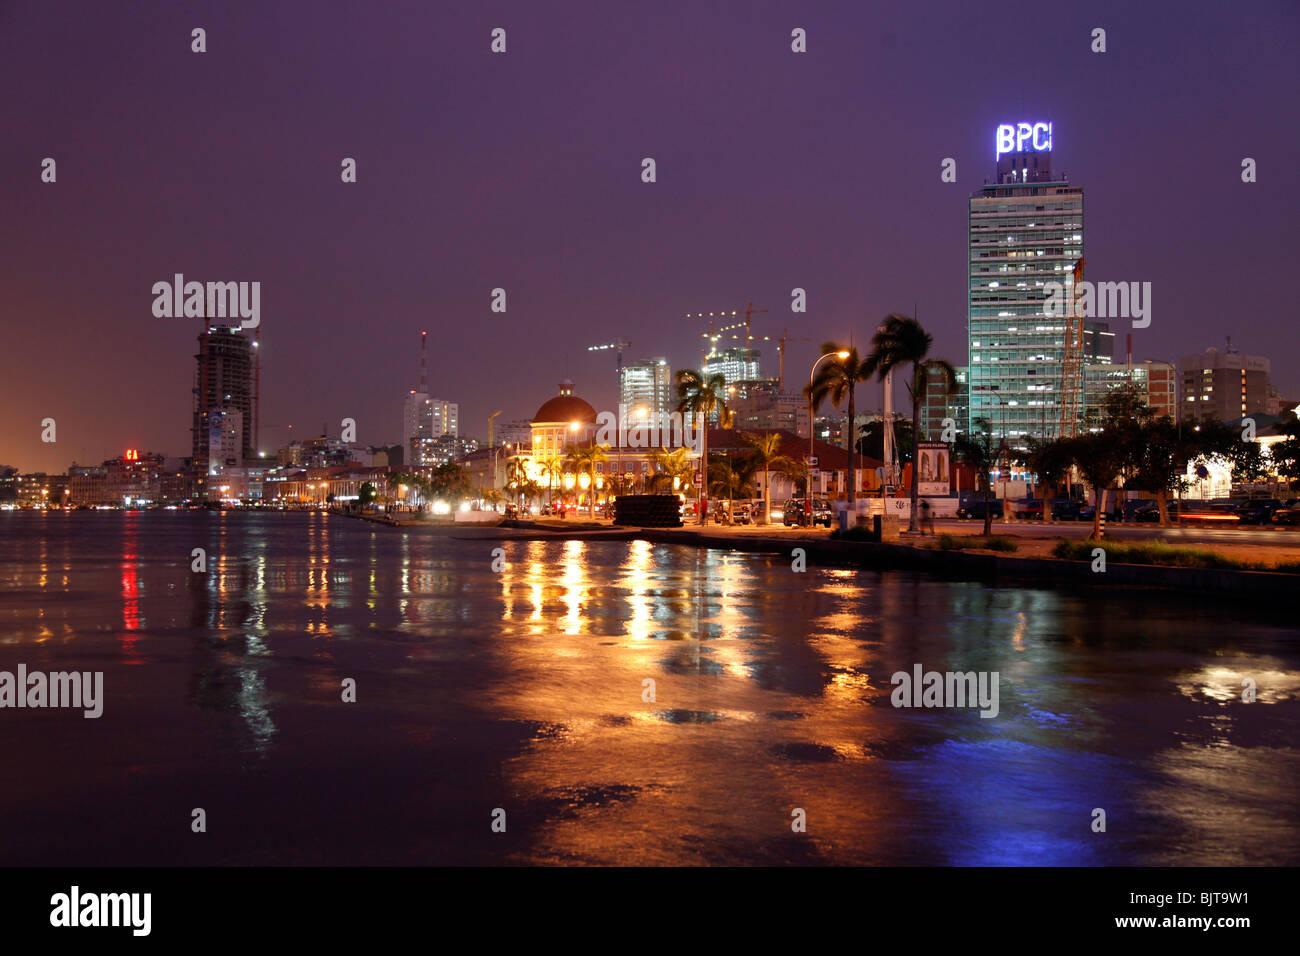 Angola's capital Luanda's skyline at night. Luanda Province, Angola. Africa. - Stock Image